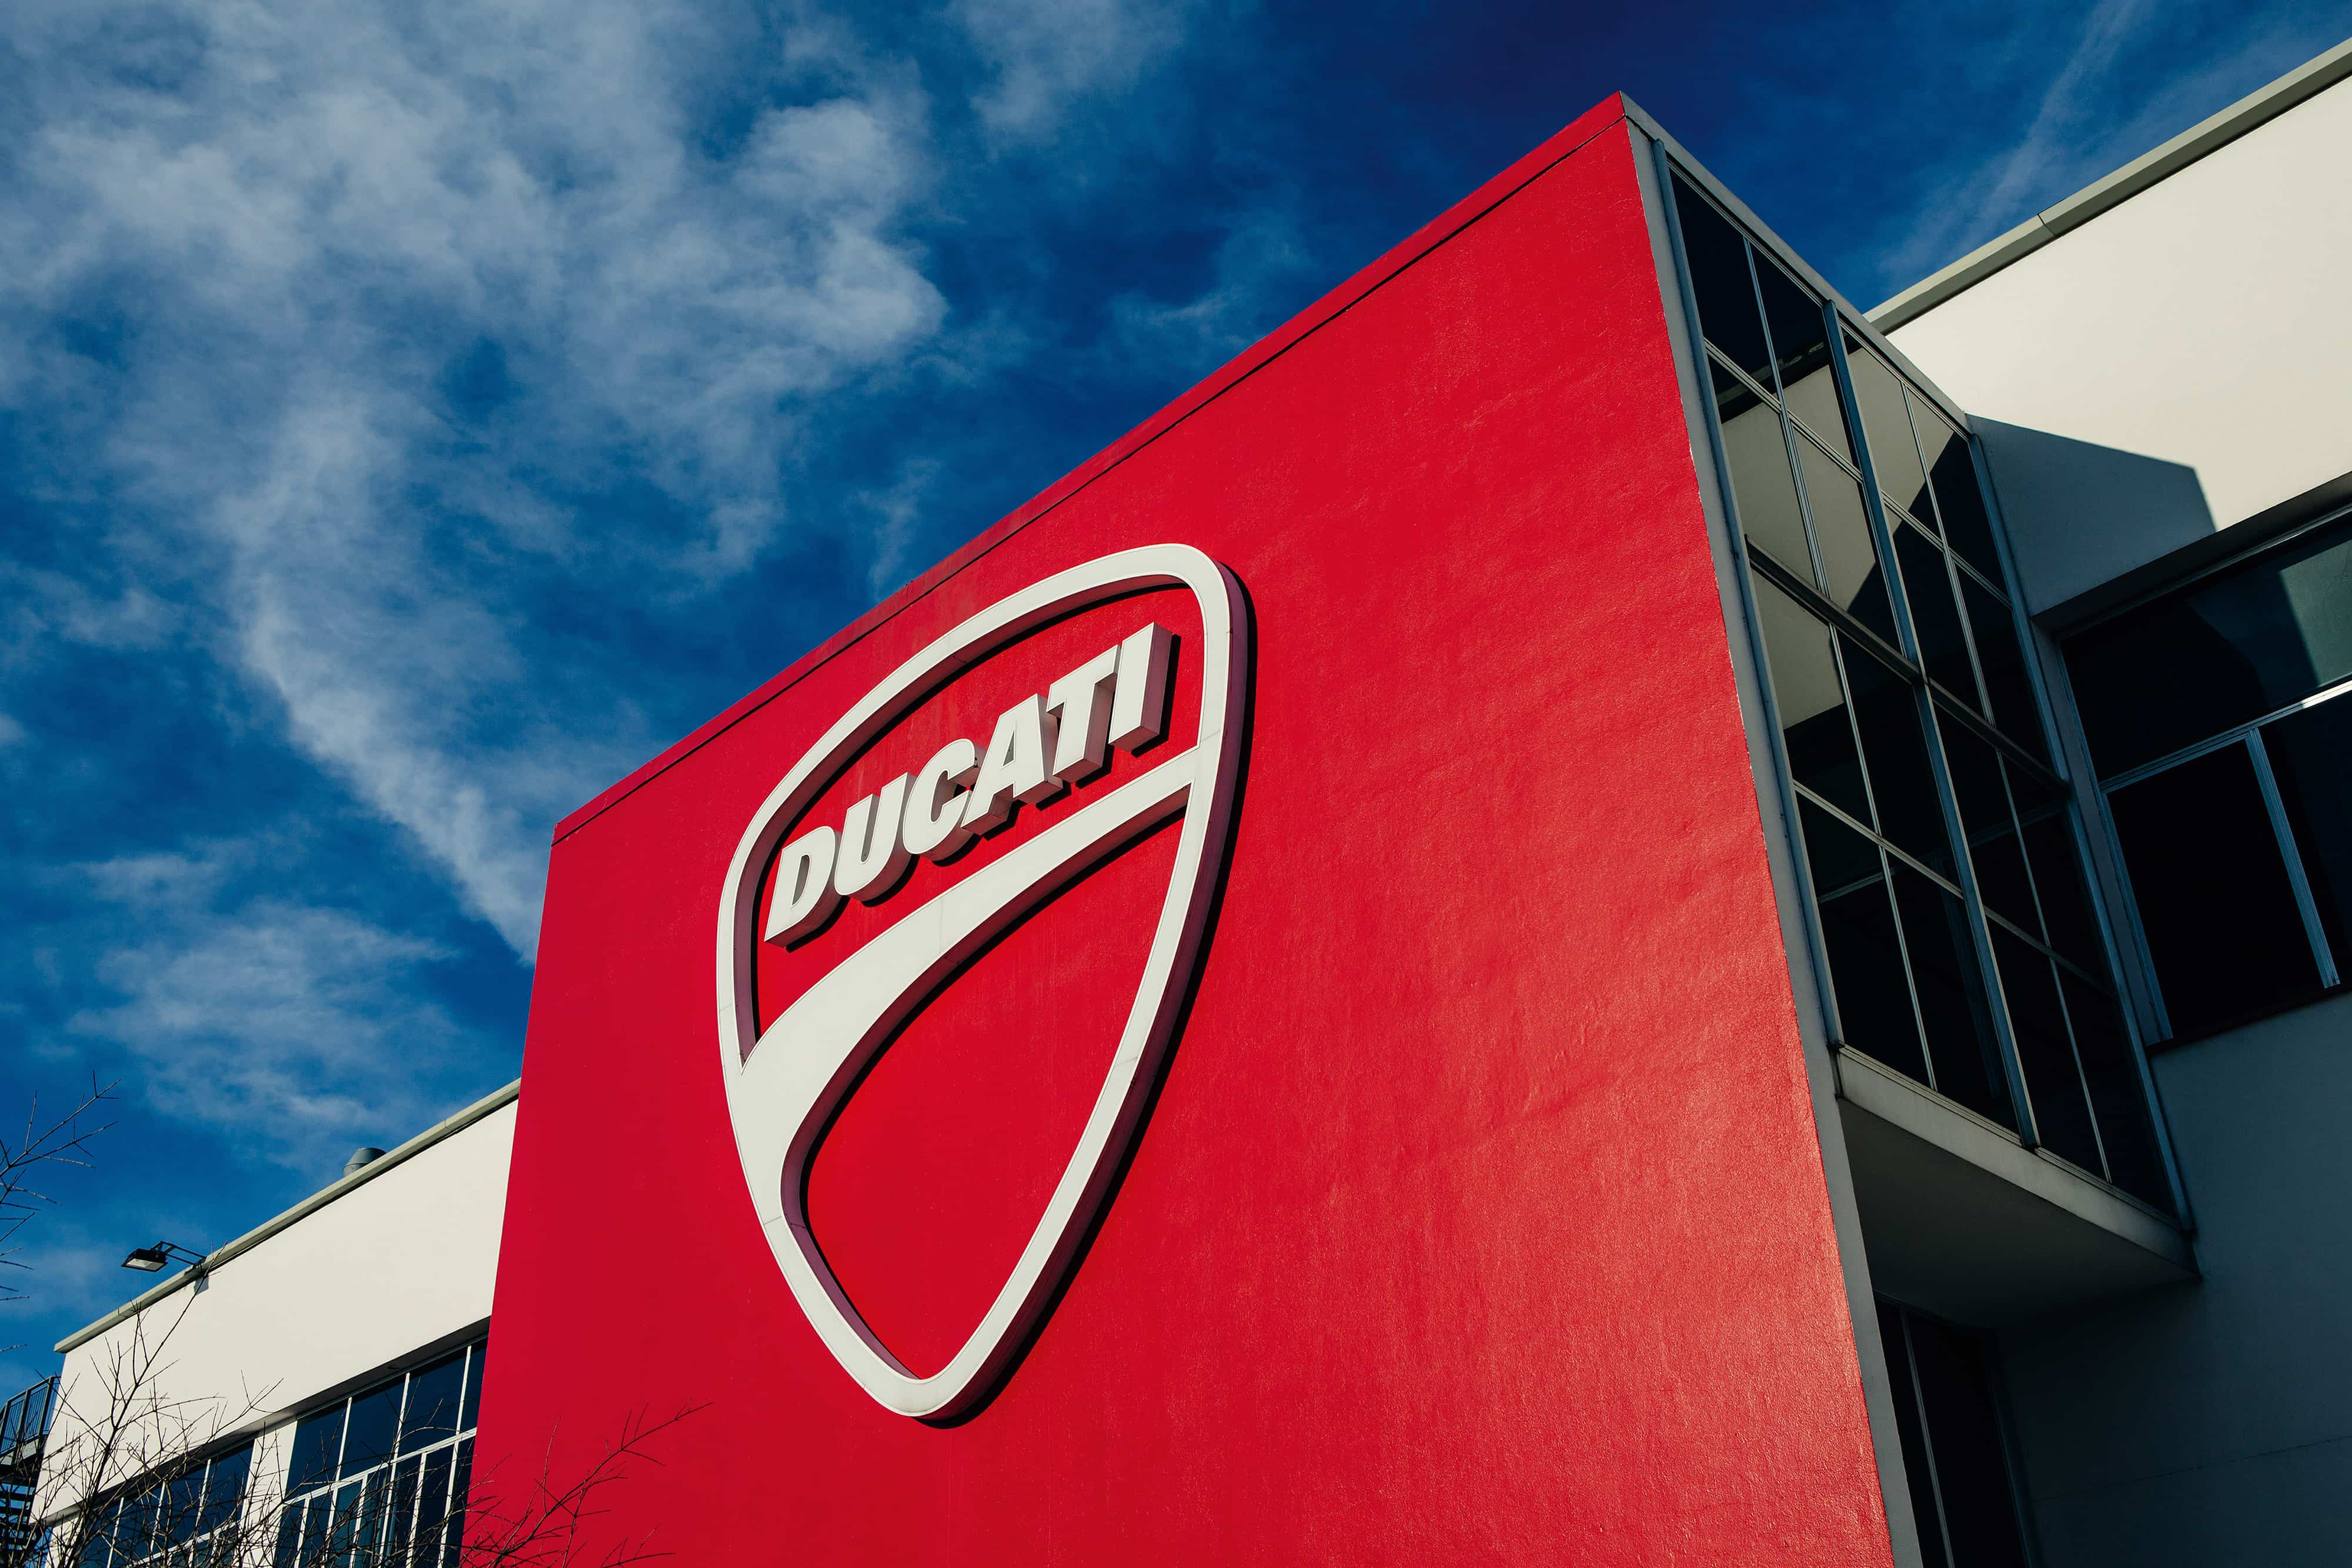 Ducati 2020年セールスは7週間の生産停止の影響を受けて、2019年比で9.7%減